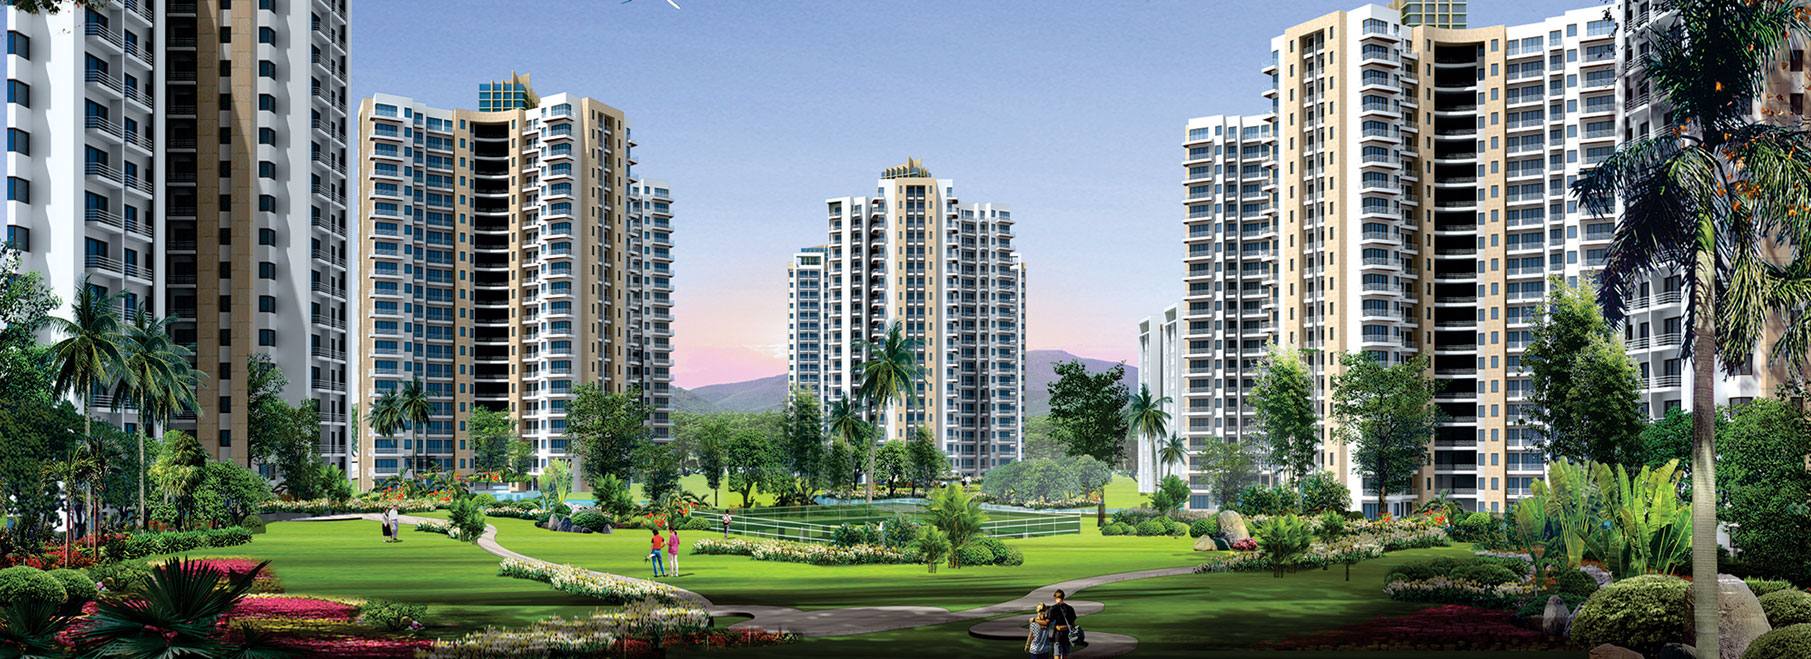 property-amravati